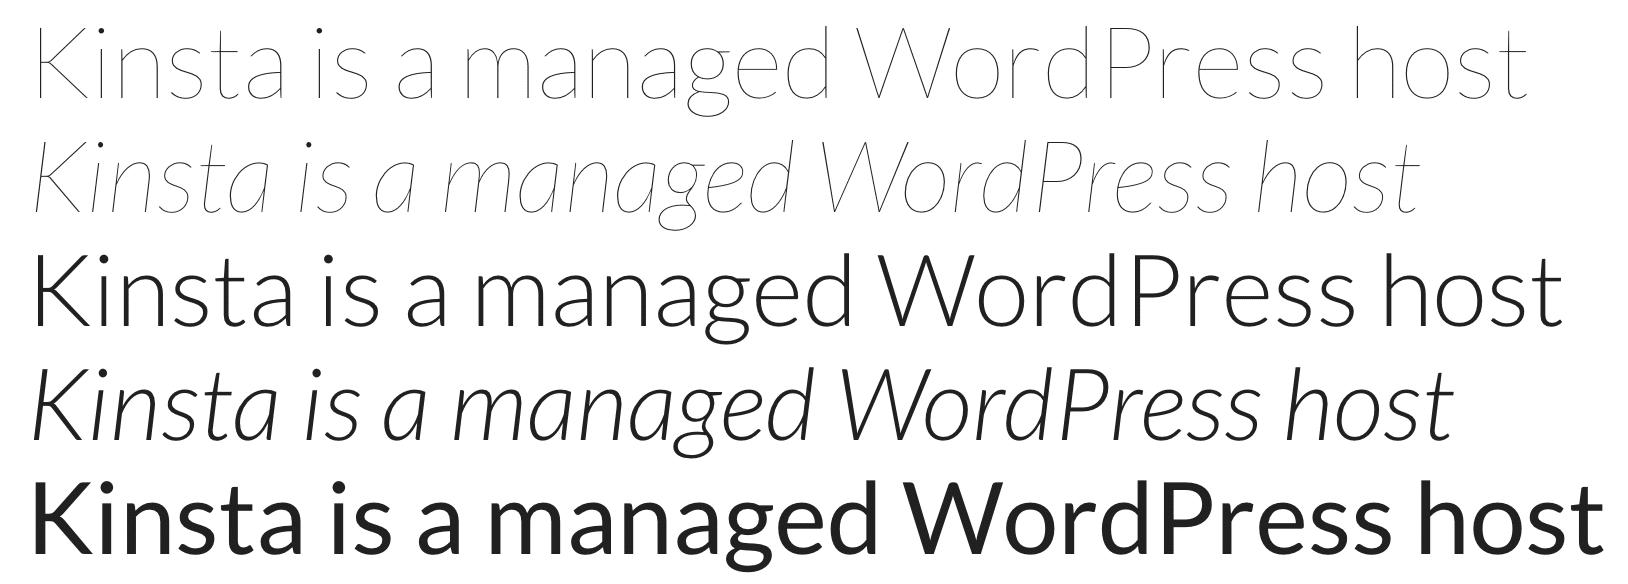 Lato Google font